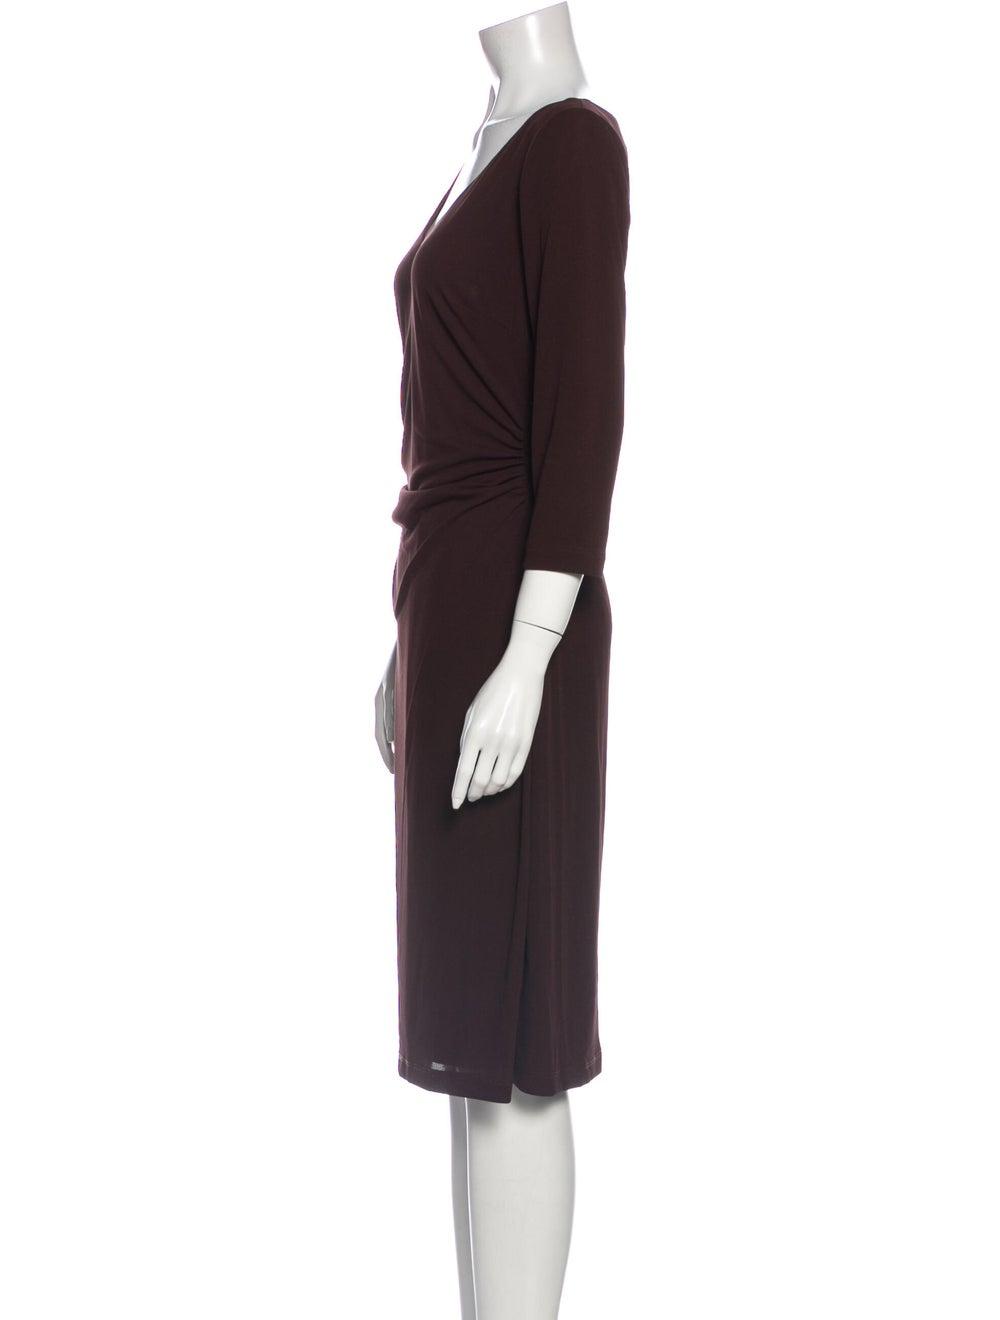 David Meister V-Neck Midi Length Dress Brown - image 2